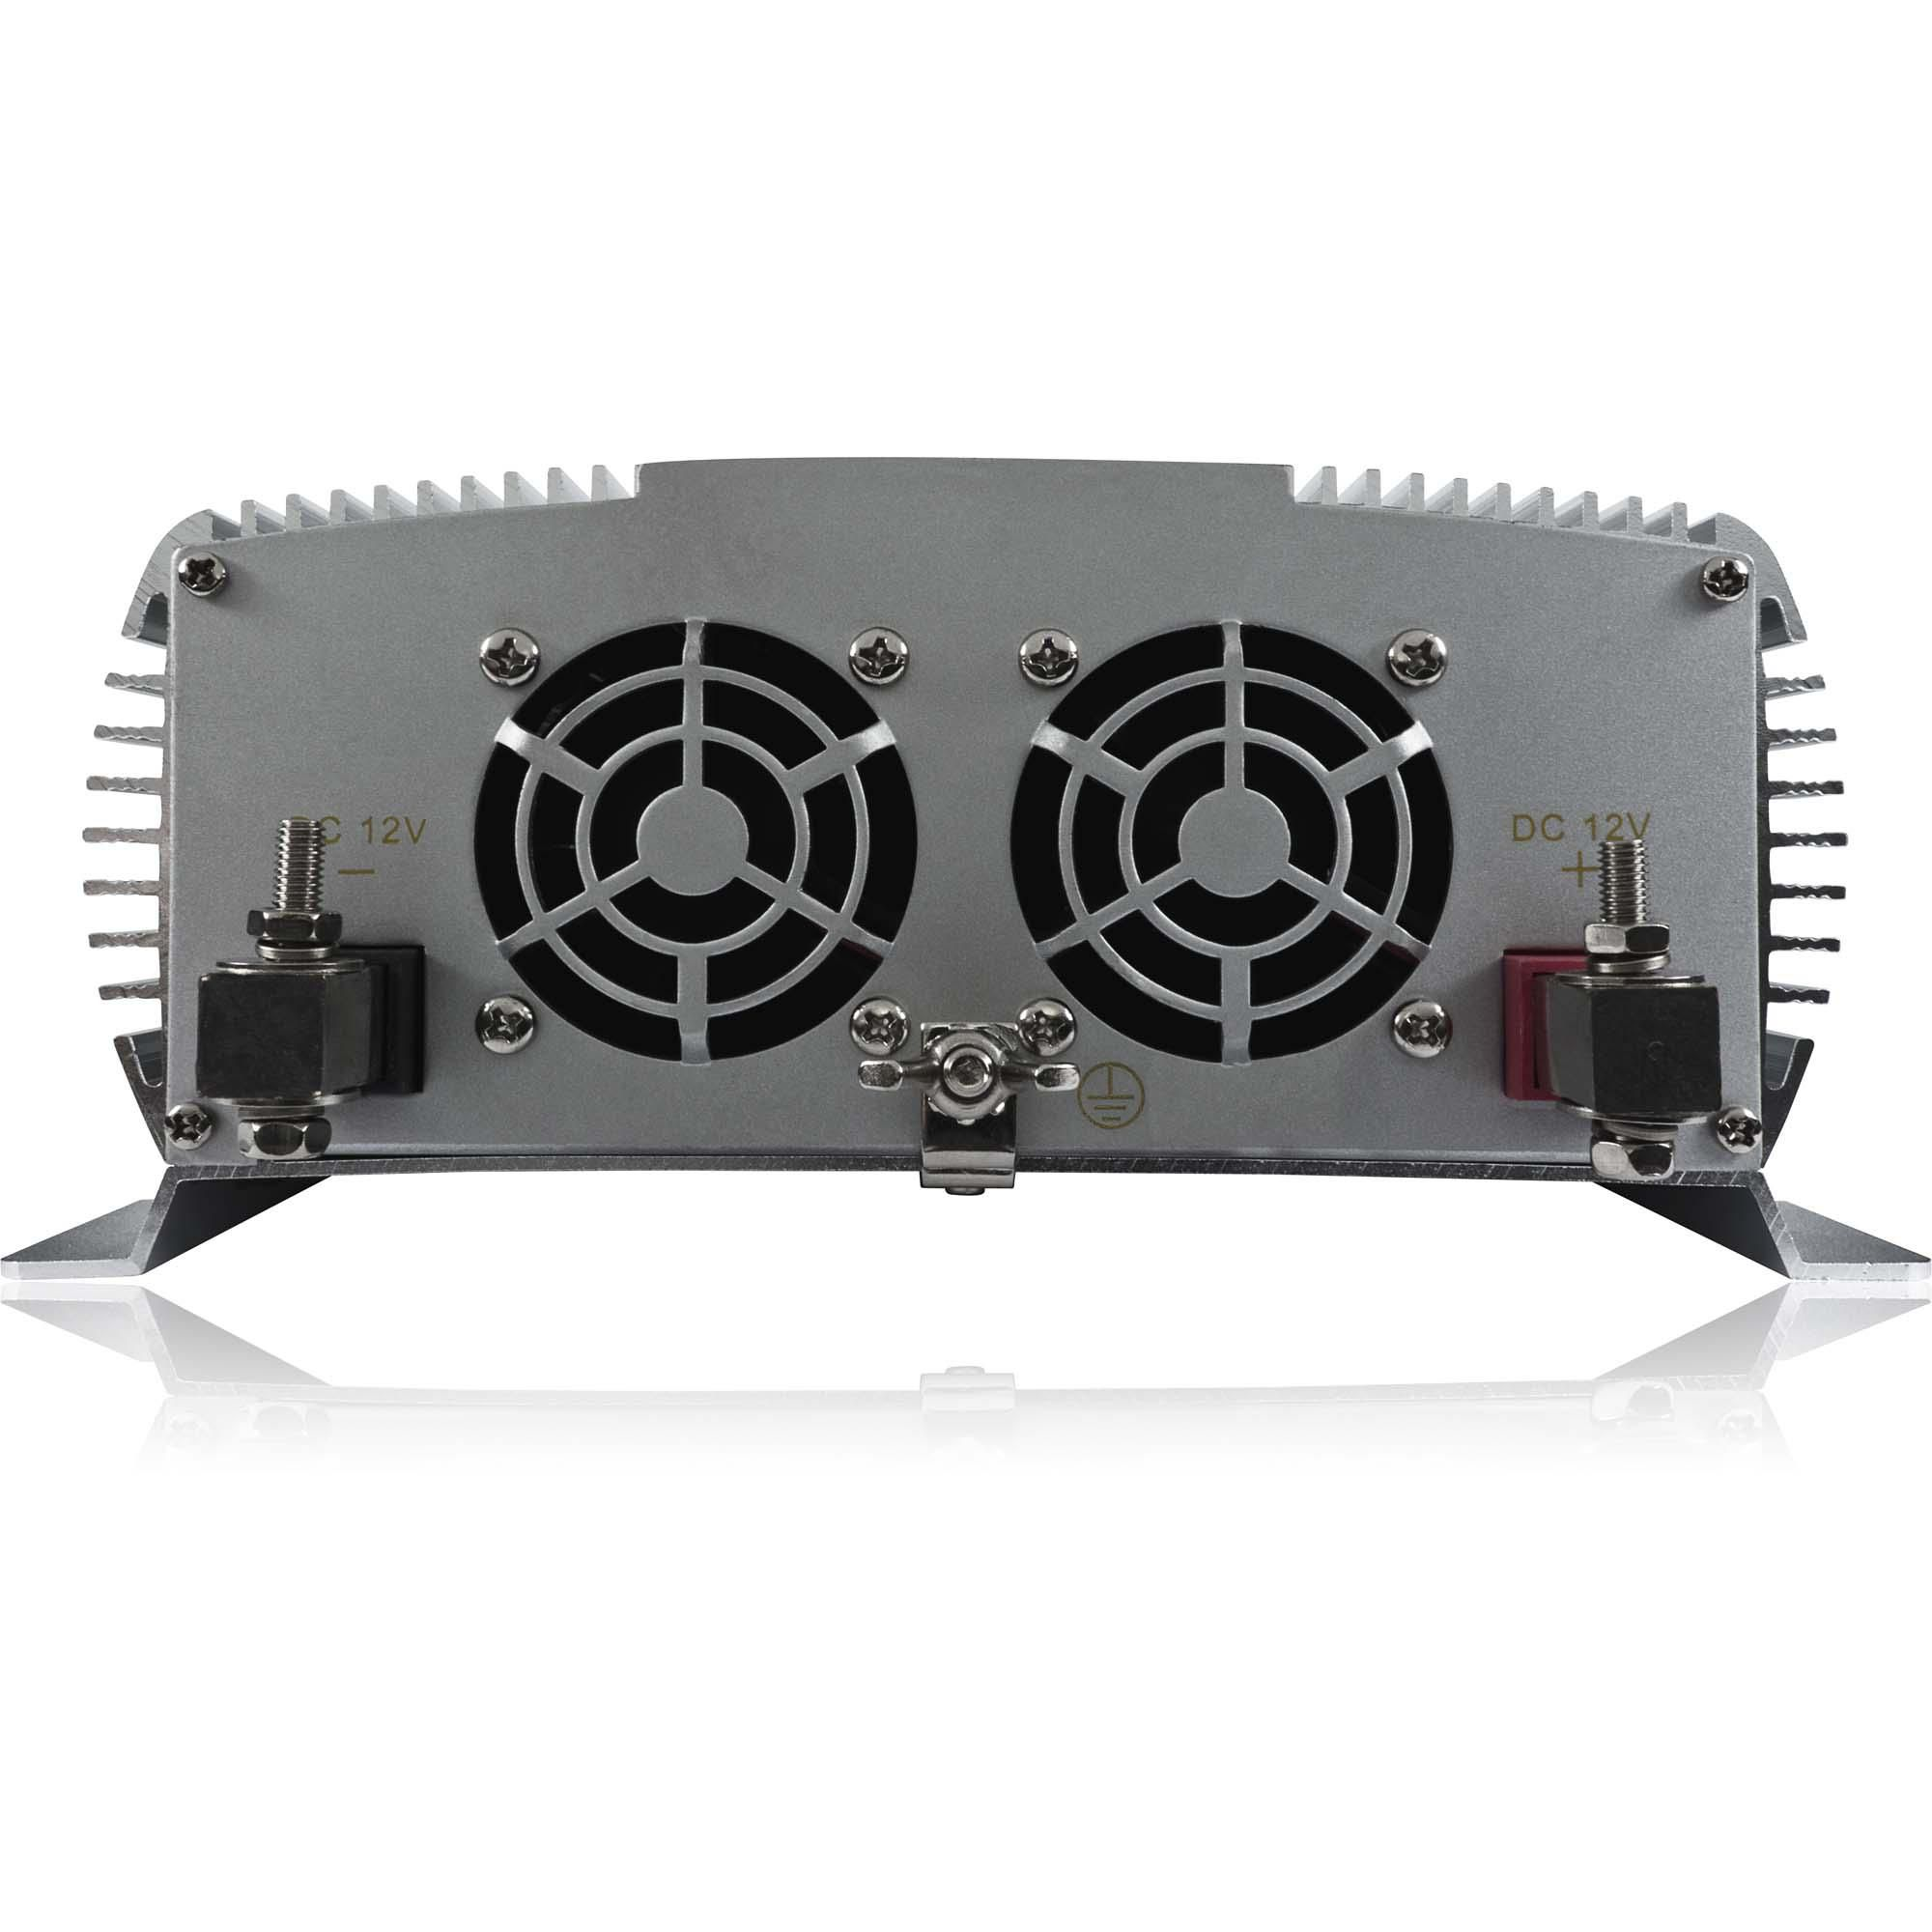 Inversor 2000w 12VDC/110V Onda Senoidal USB - Hayonik